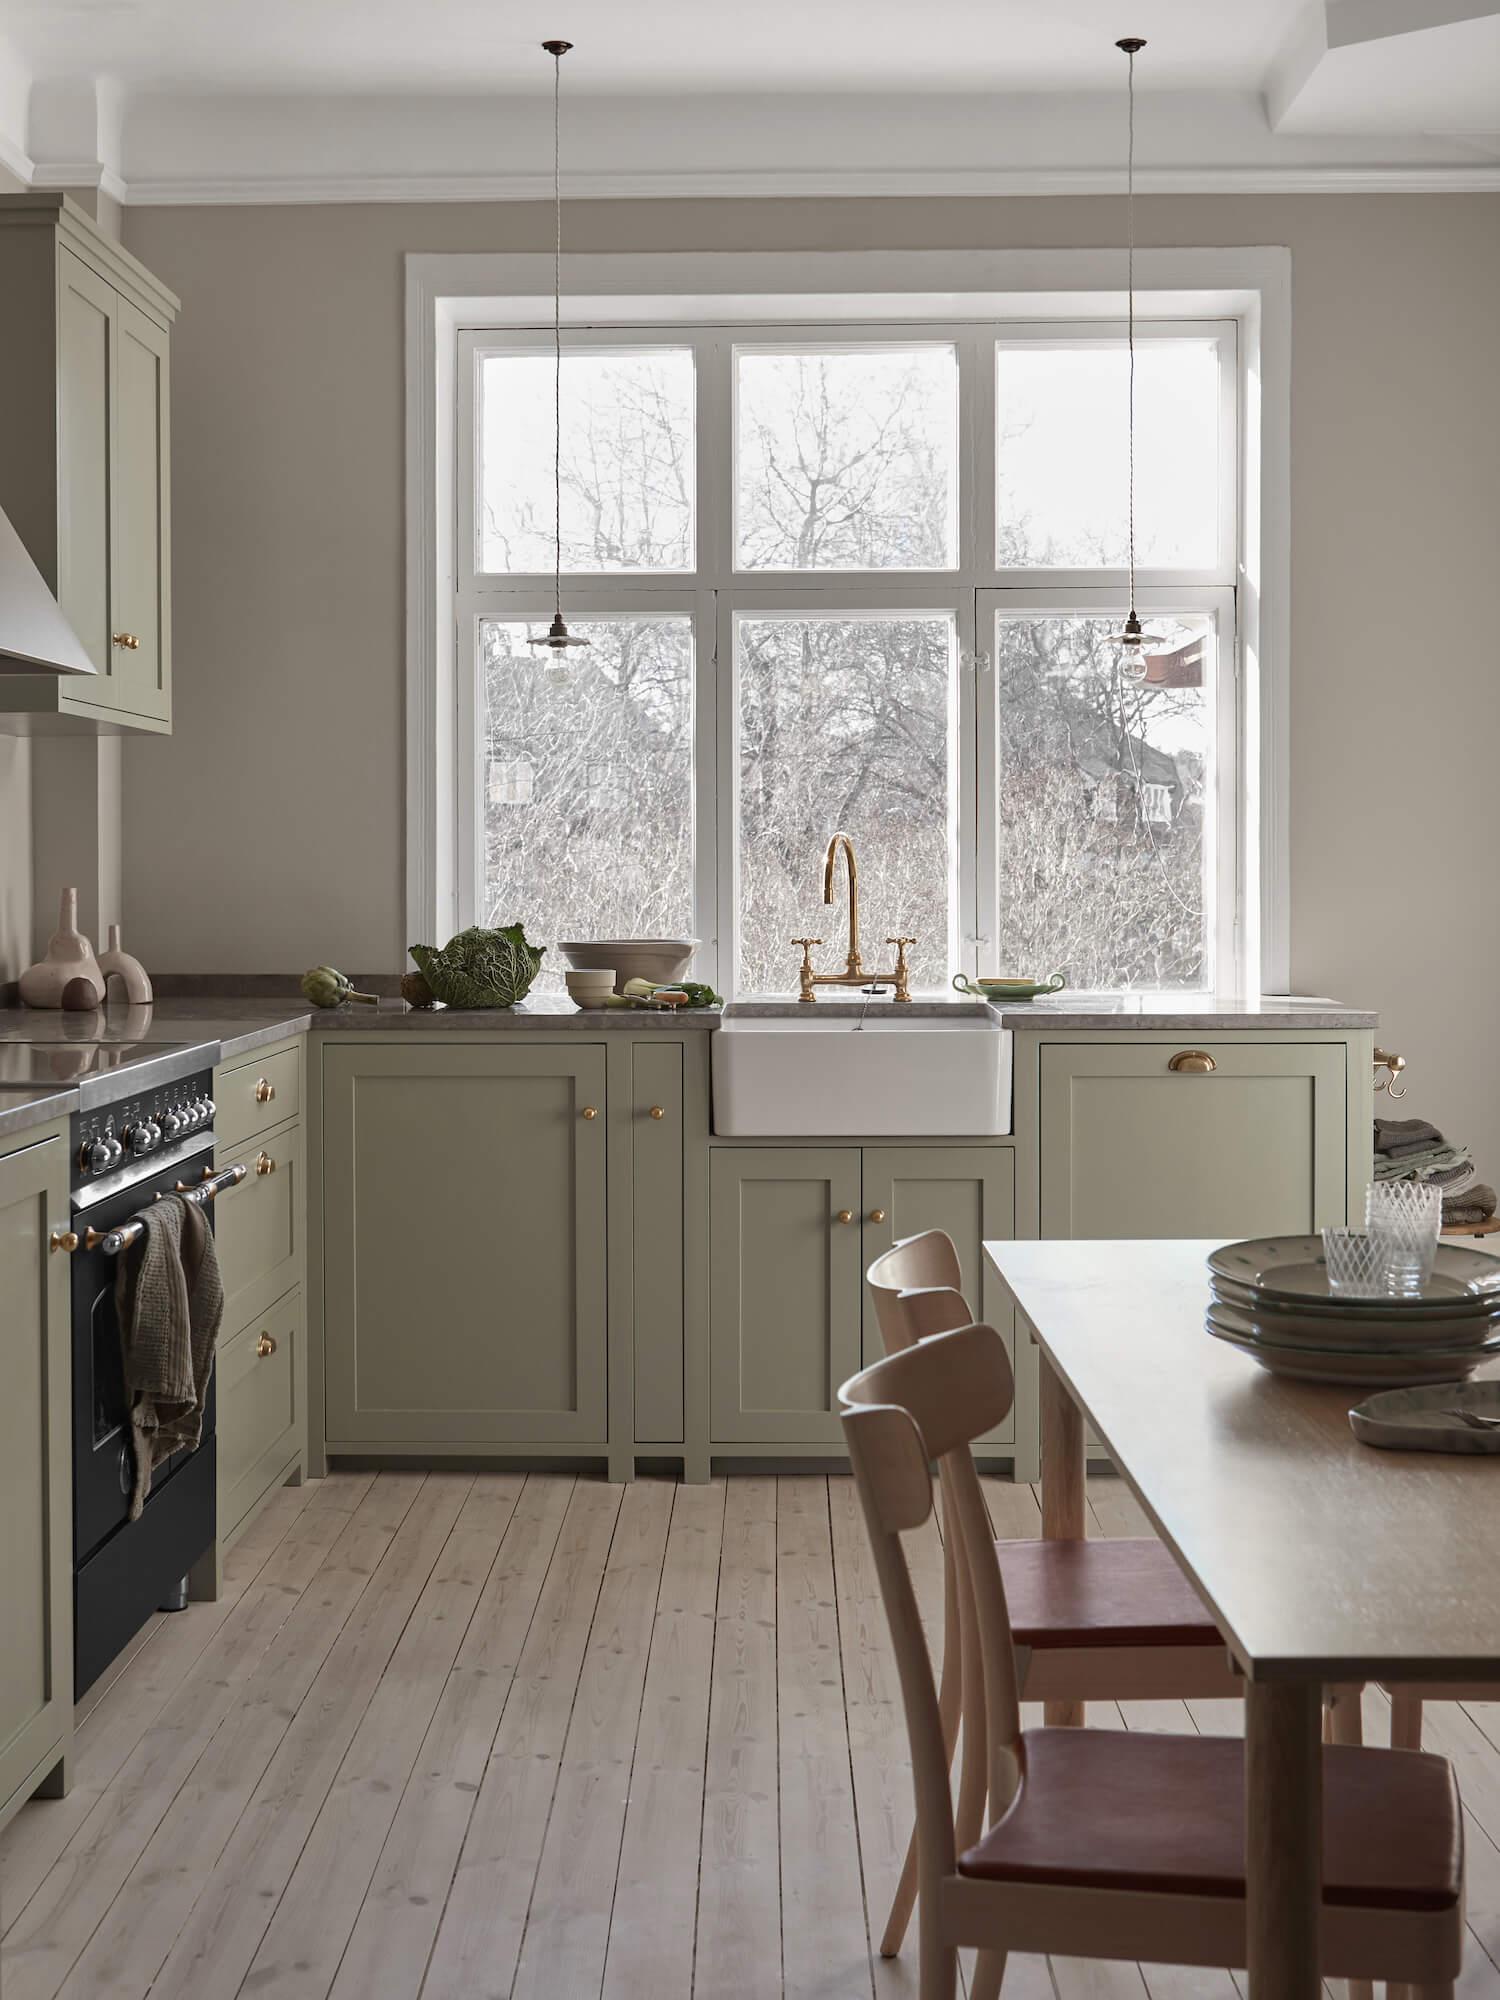 est living Nordiska Kok classic shaker kitchen 03